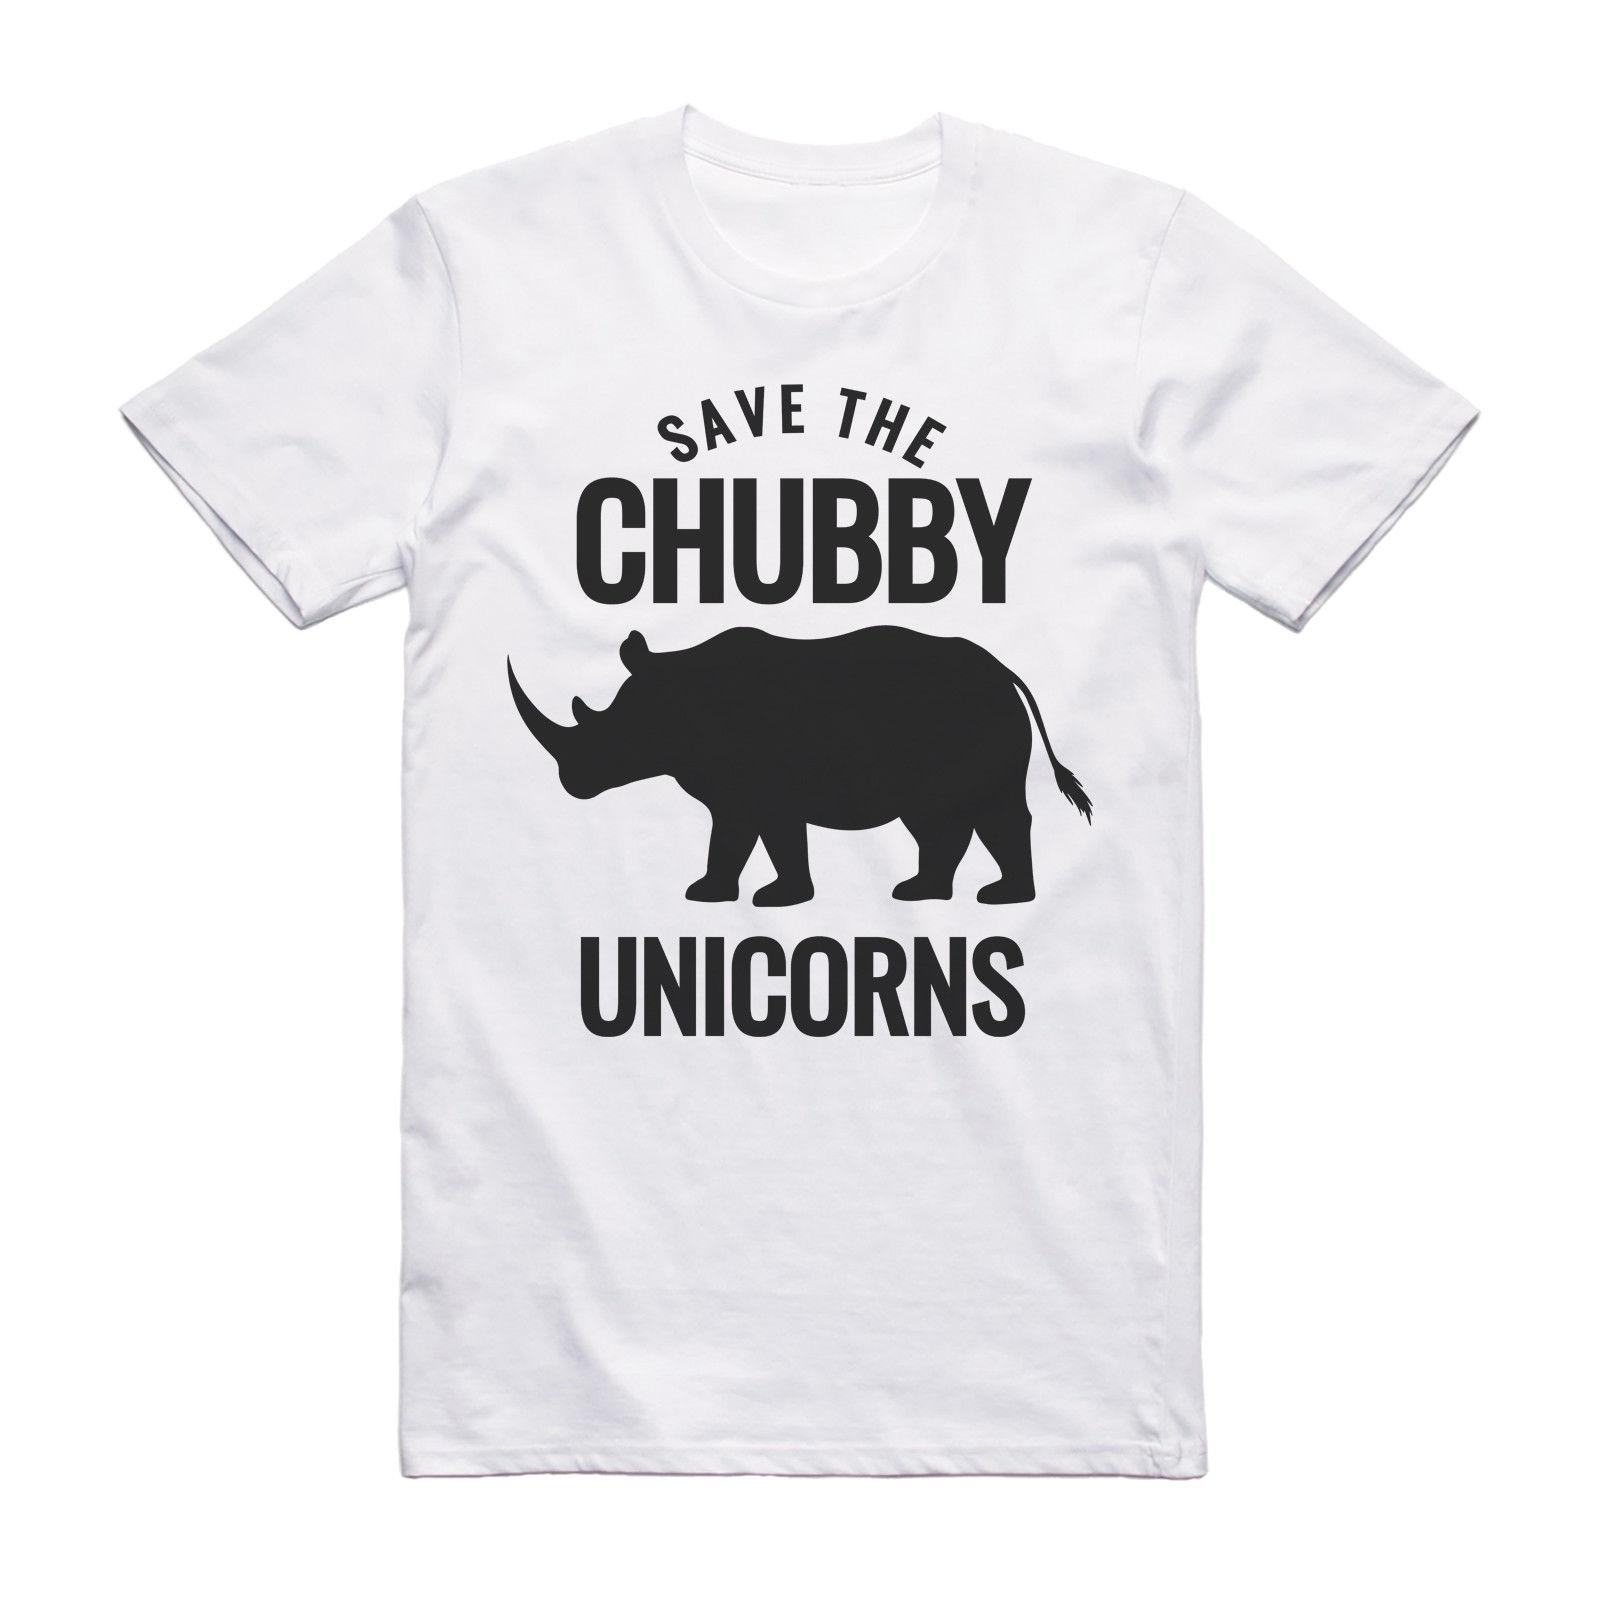 b41ae34232b45 Save the chubby unicorn rhino shirt funny animal love hipster tee jpg  1600x1600 Funny animal tee